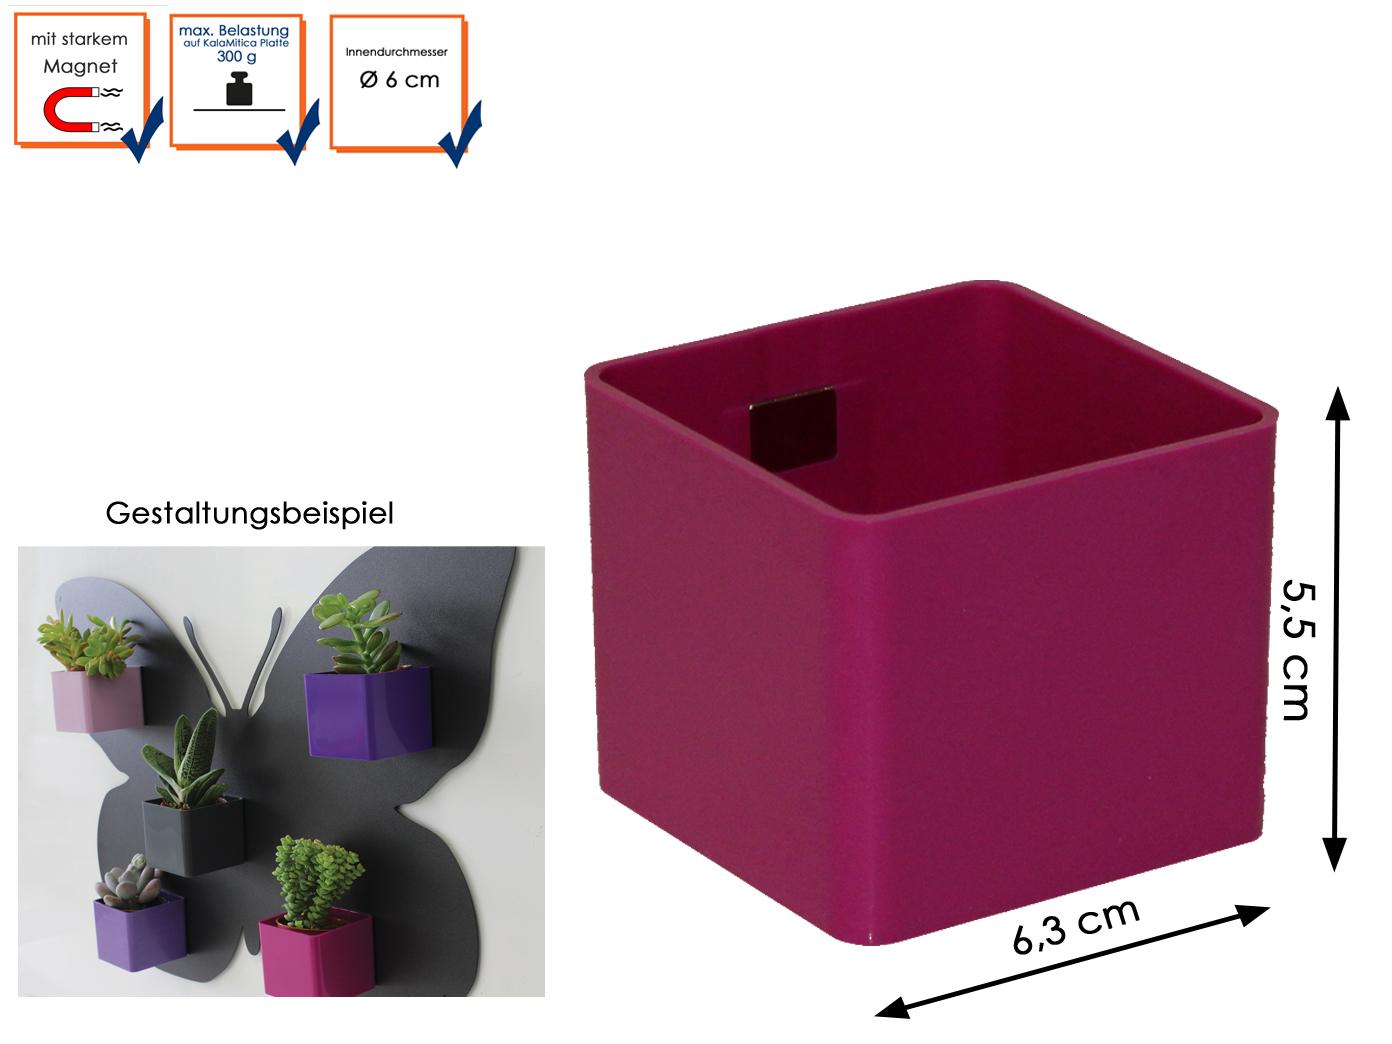 Kunststofftopf mit Magnet Mini Würfe Ø 6 cm KalaMitica Wanddeko Aufbewahrung